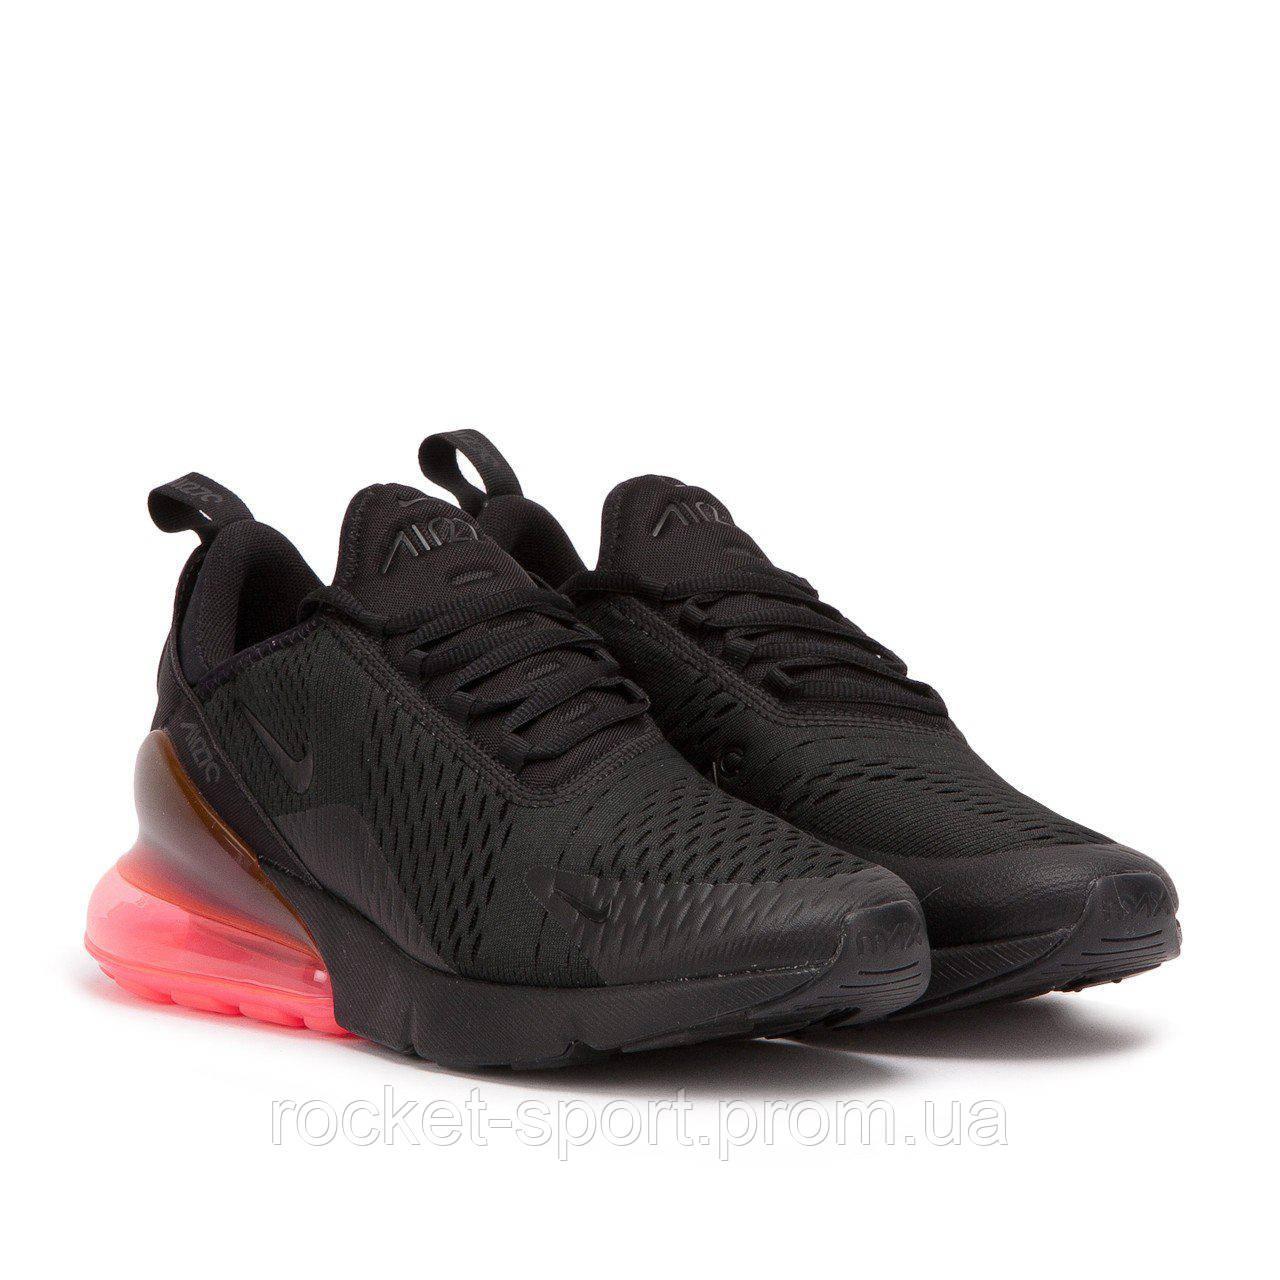 4bc11f0e97e8 Женские кроссовки Nike Air Max 270